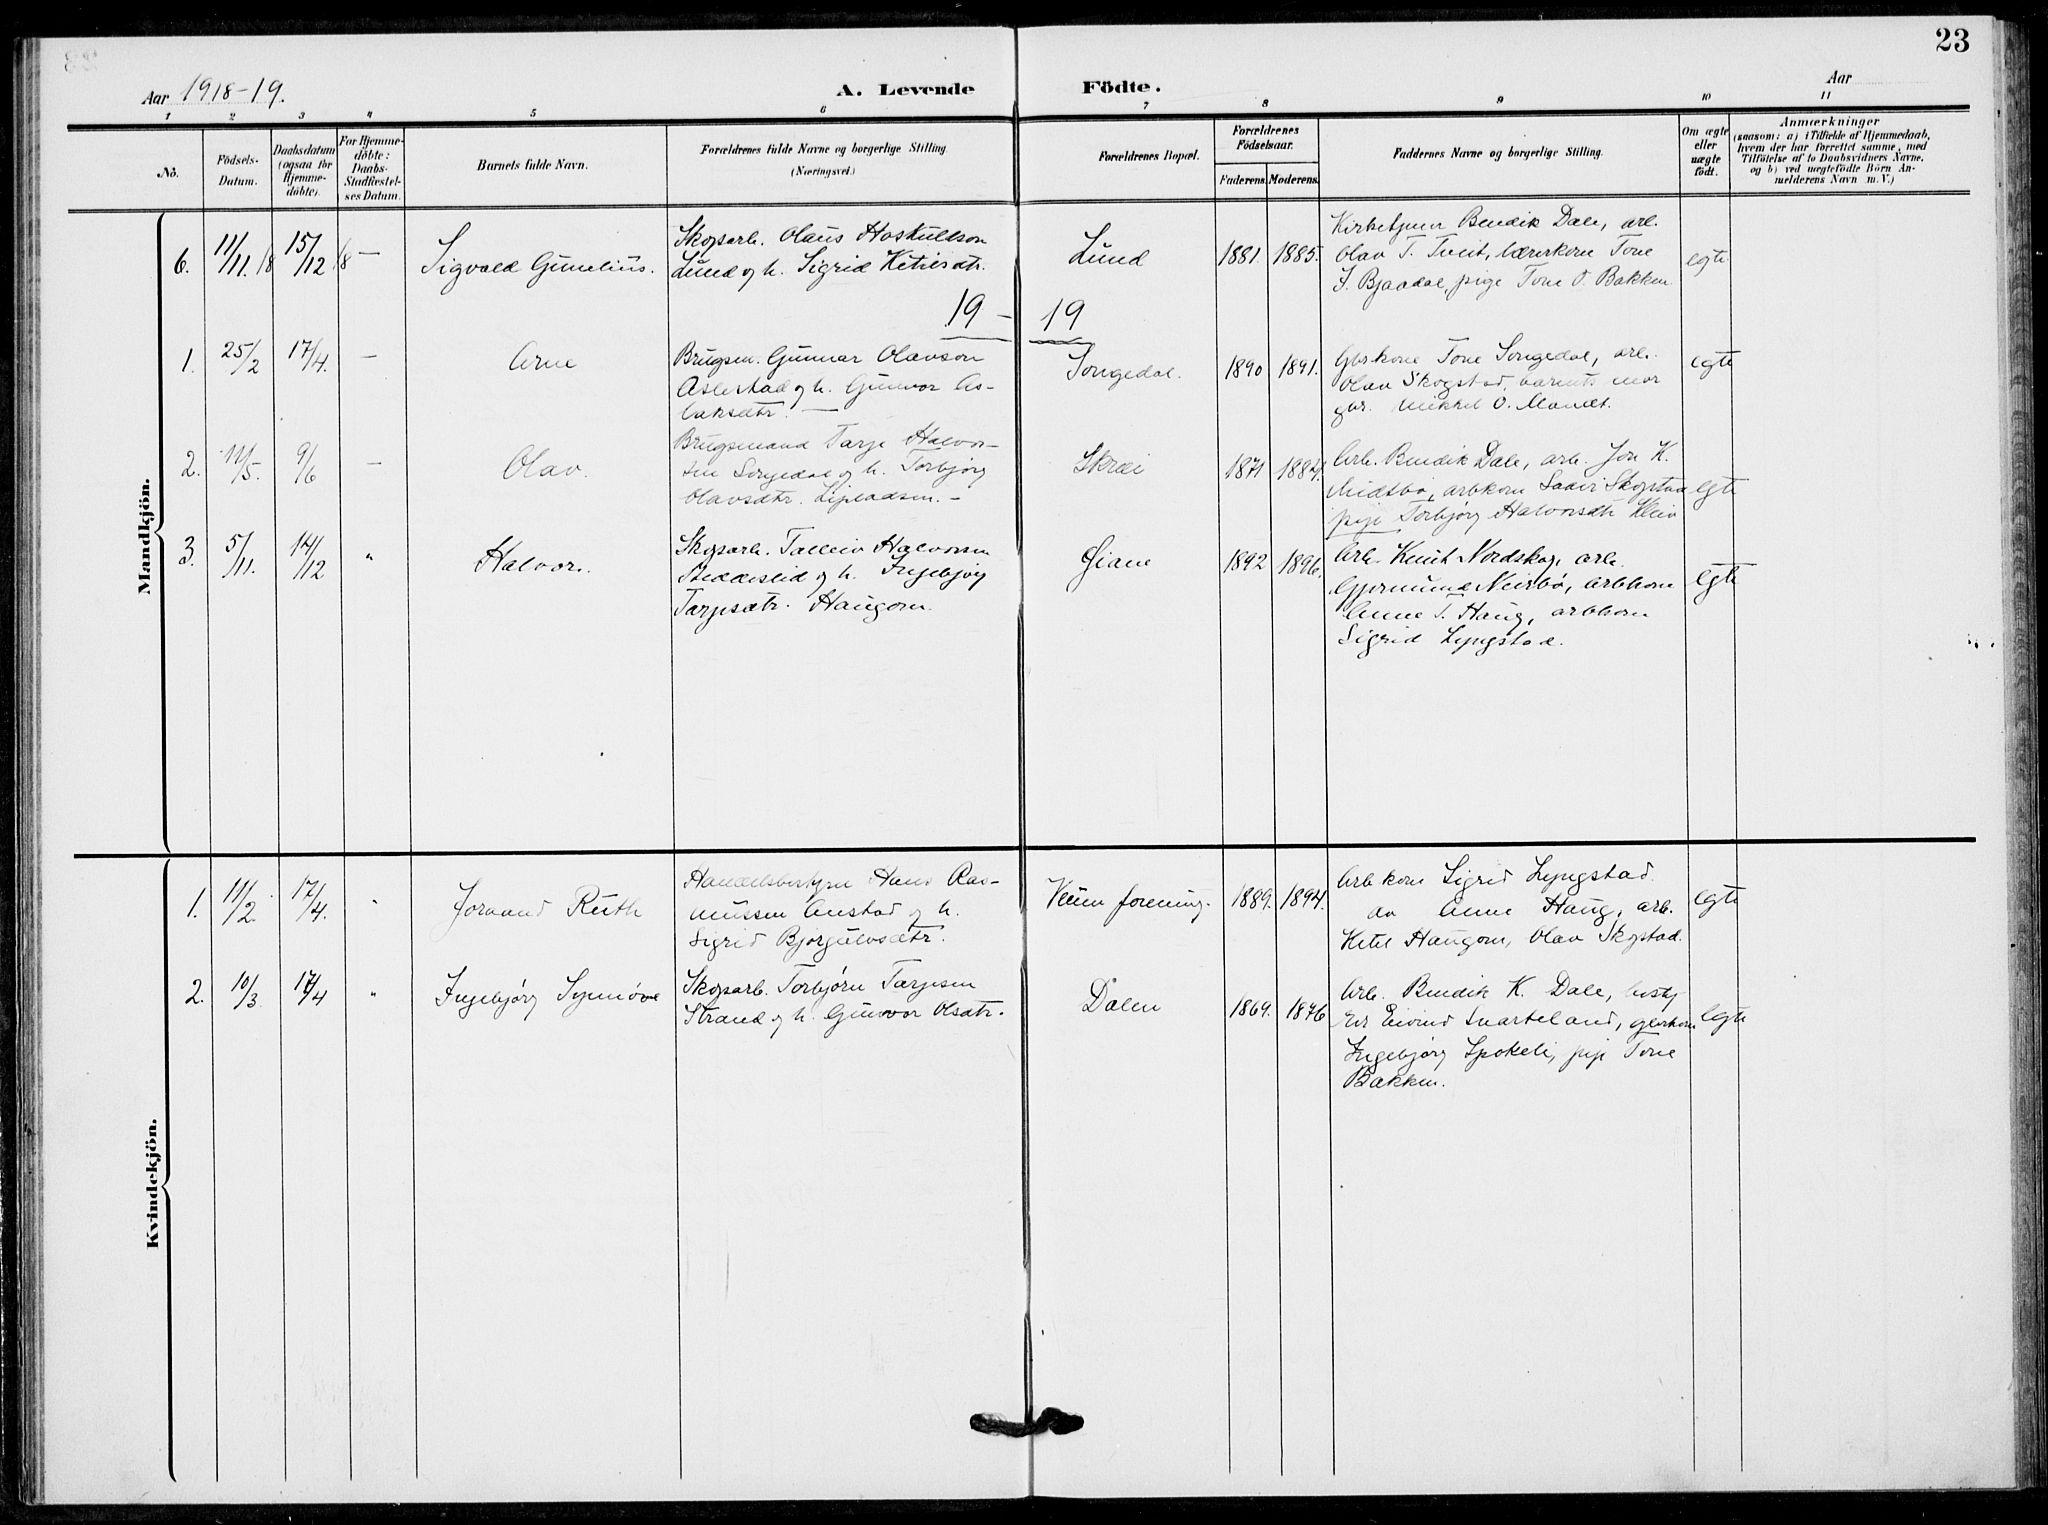 SAKO, Fyresdal kirkebøker, F/Fb/L0004: Ministerialbok nr. II 4, 1903-1920, s. 23